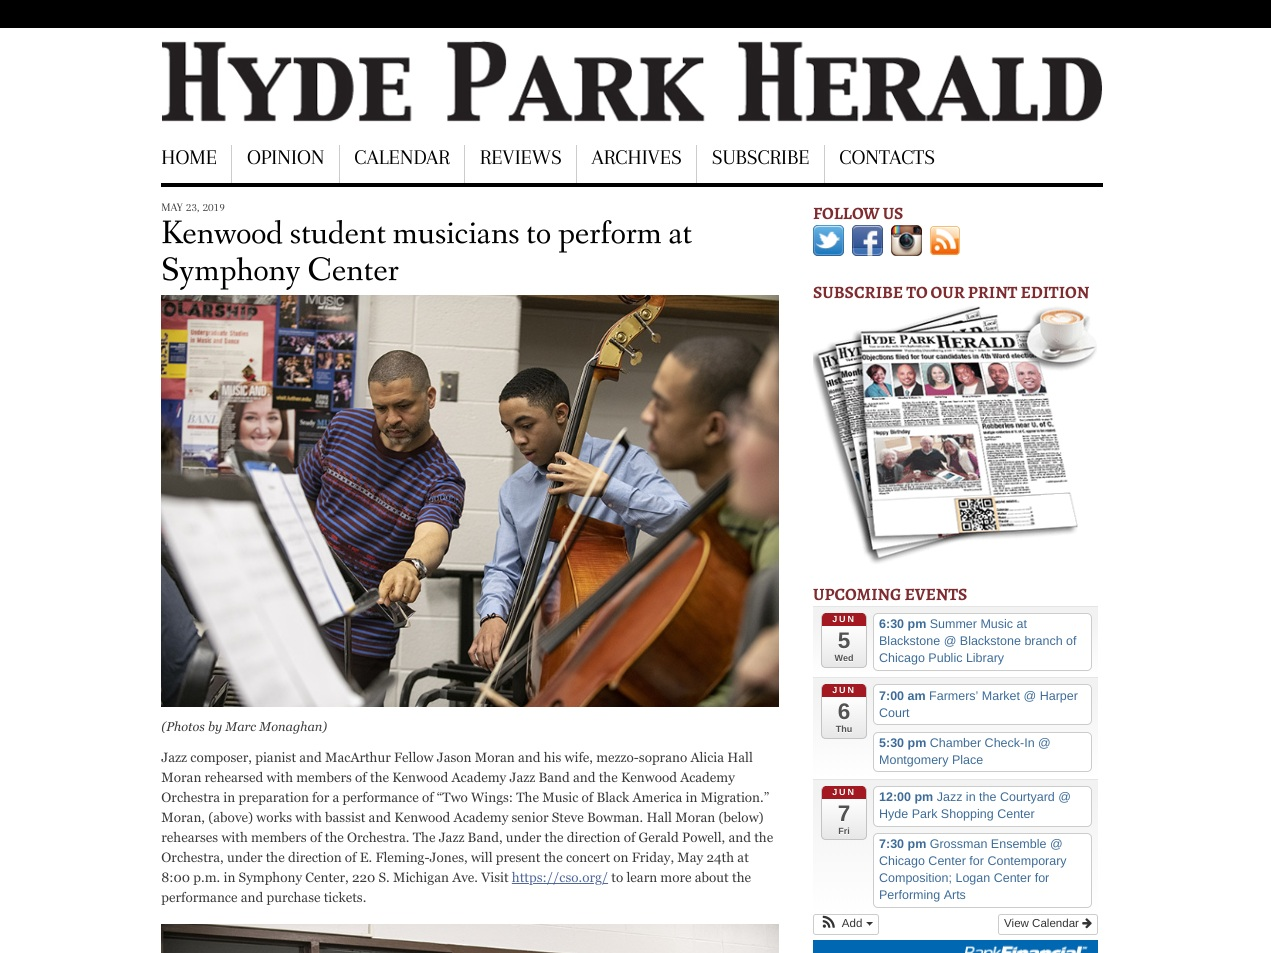 Hyde Park Herald